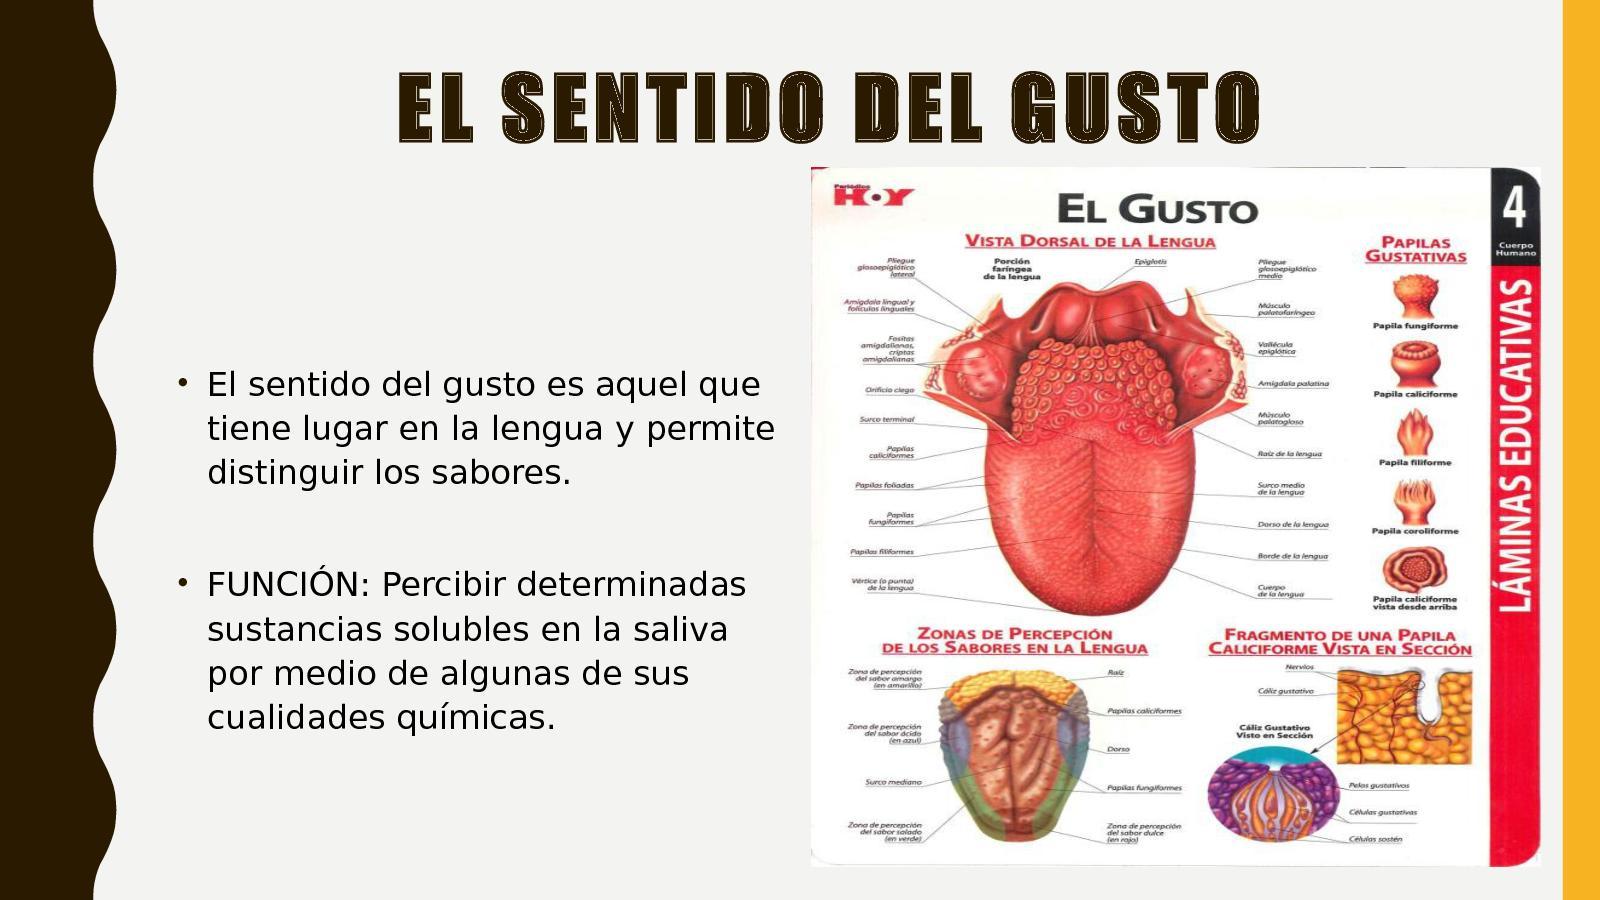 Calaméo - SENTIDO DEL GUSTO